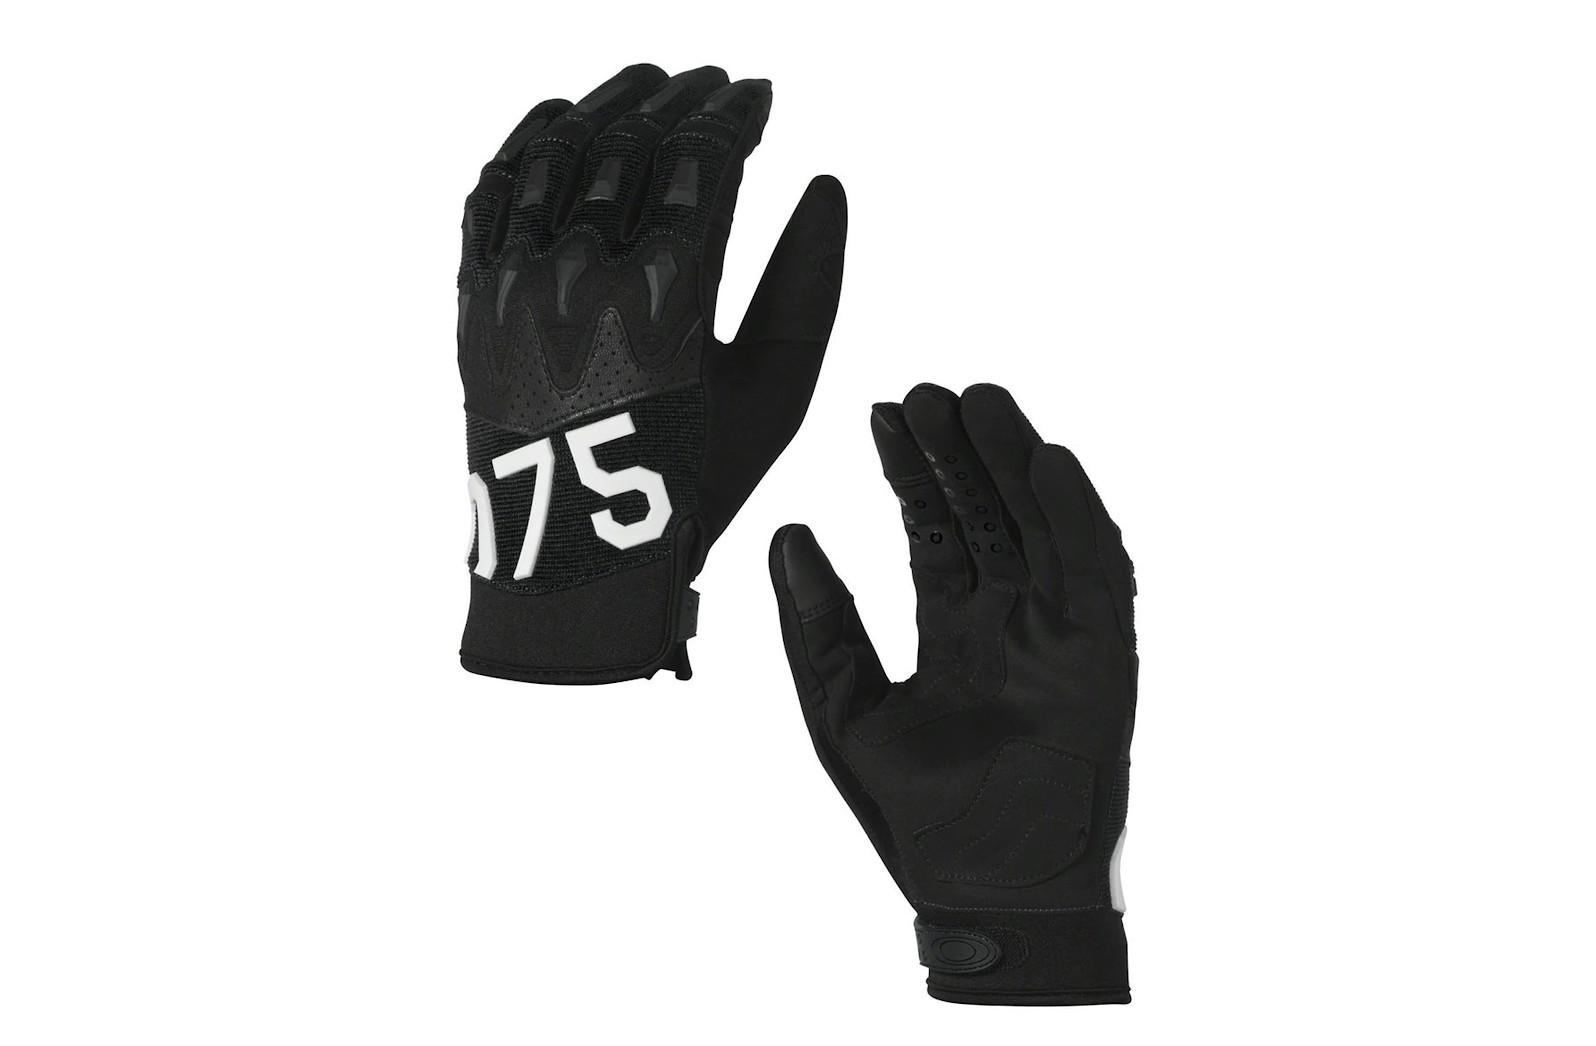 Oakley Overload 2.0 Gloves